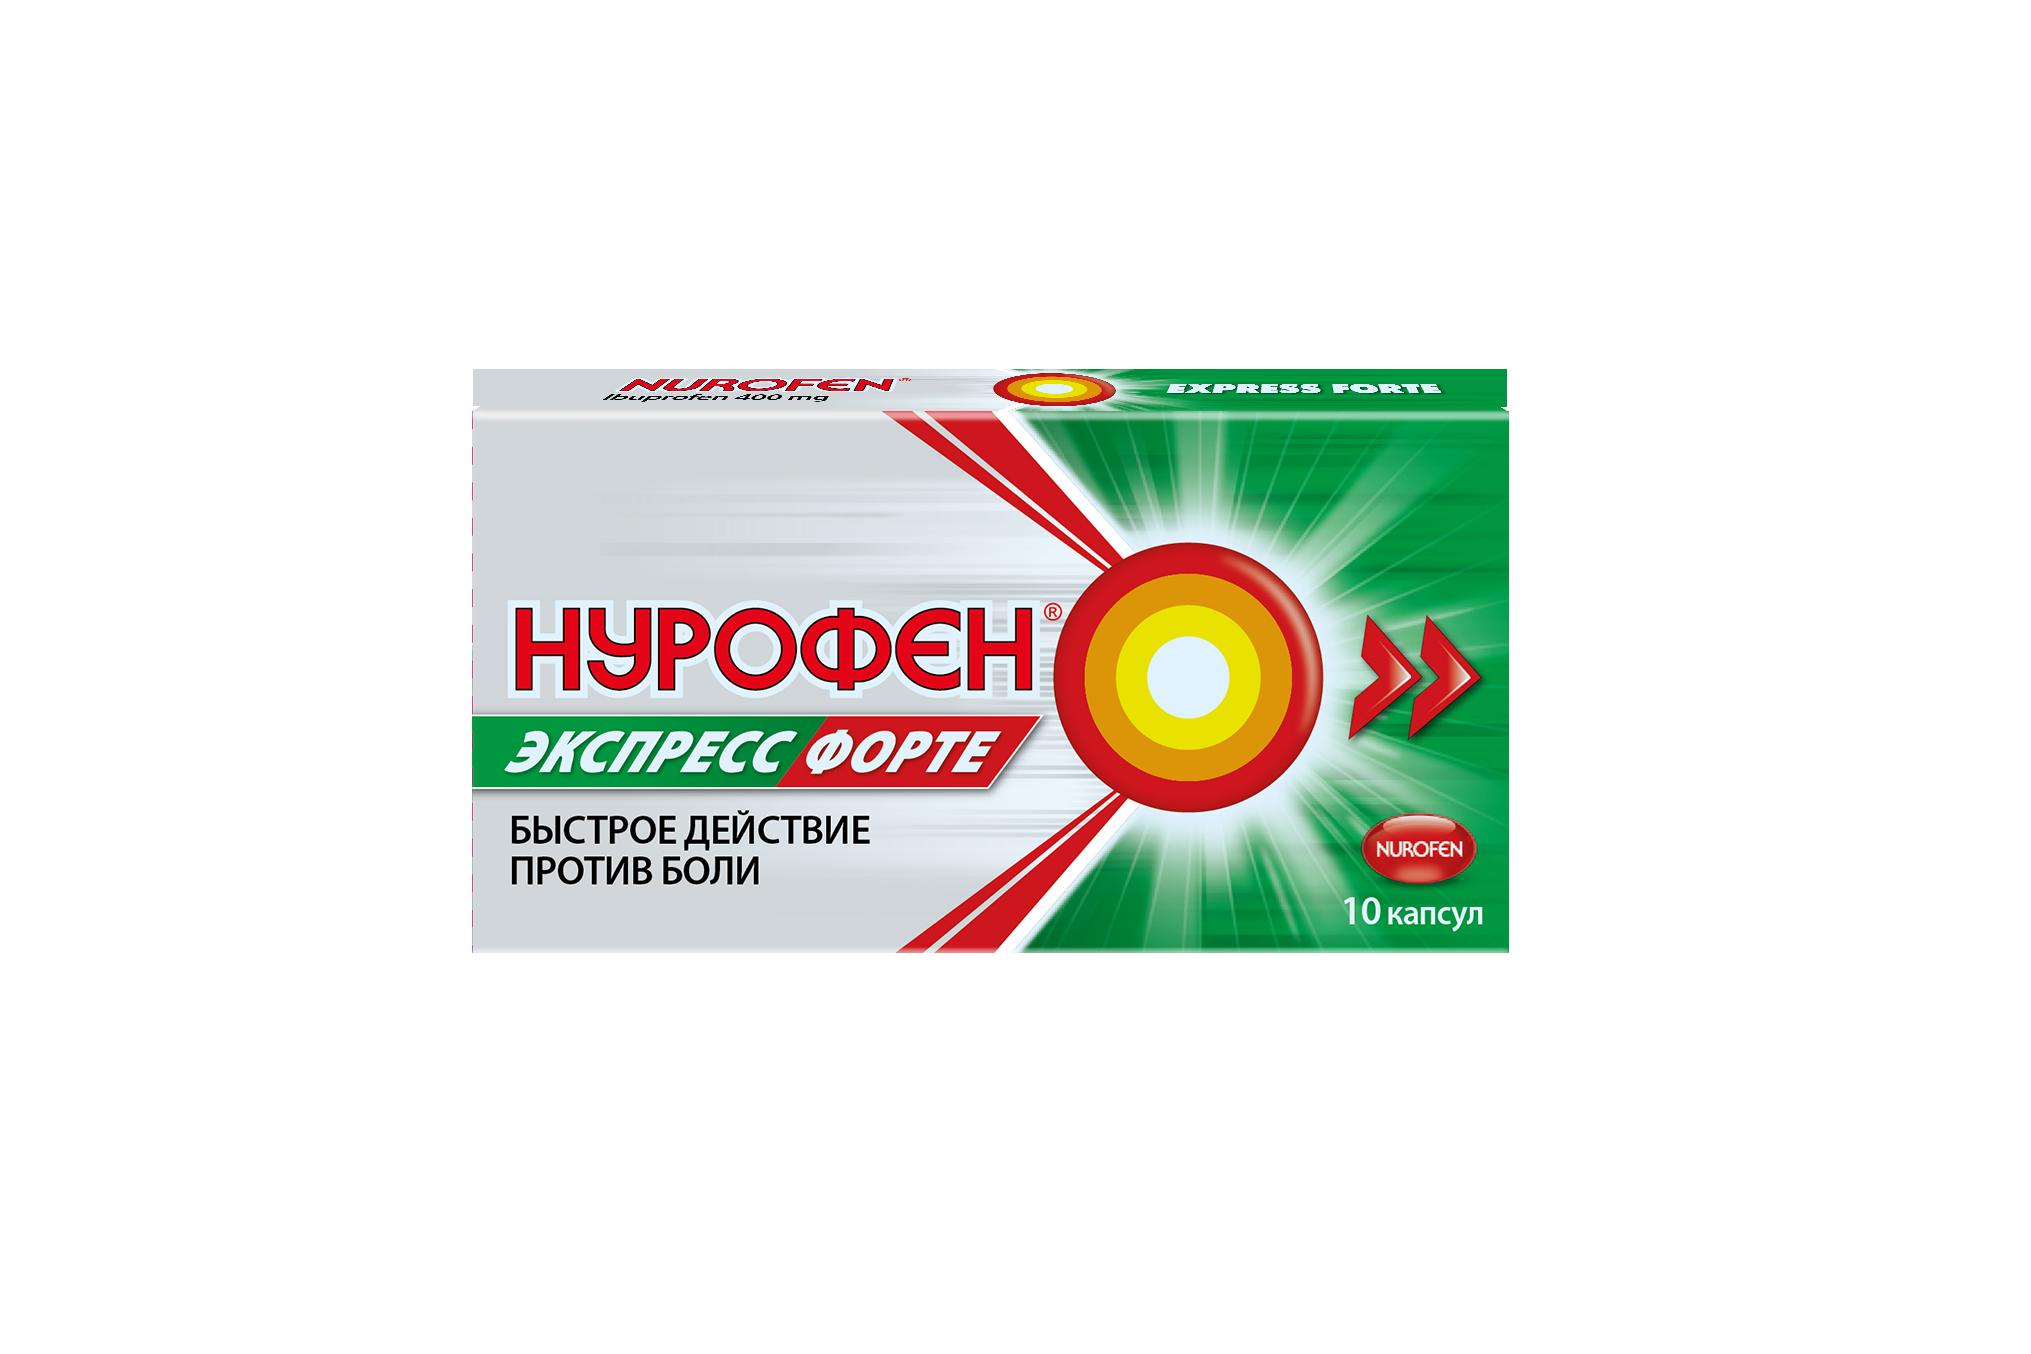 Нурофен® Экспресс Форте (10 капсул)